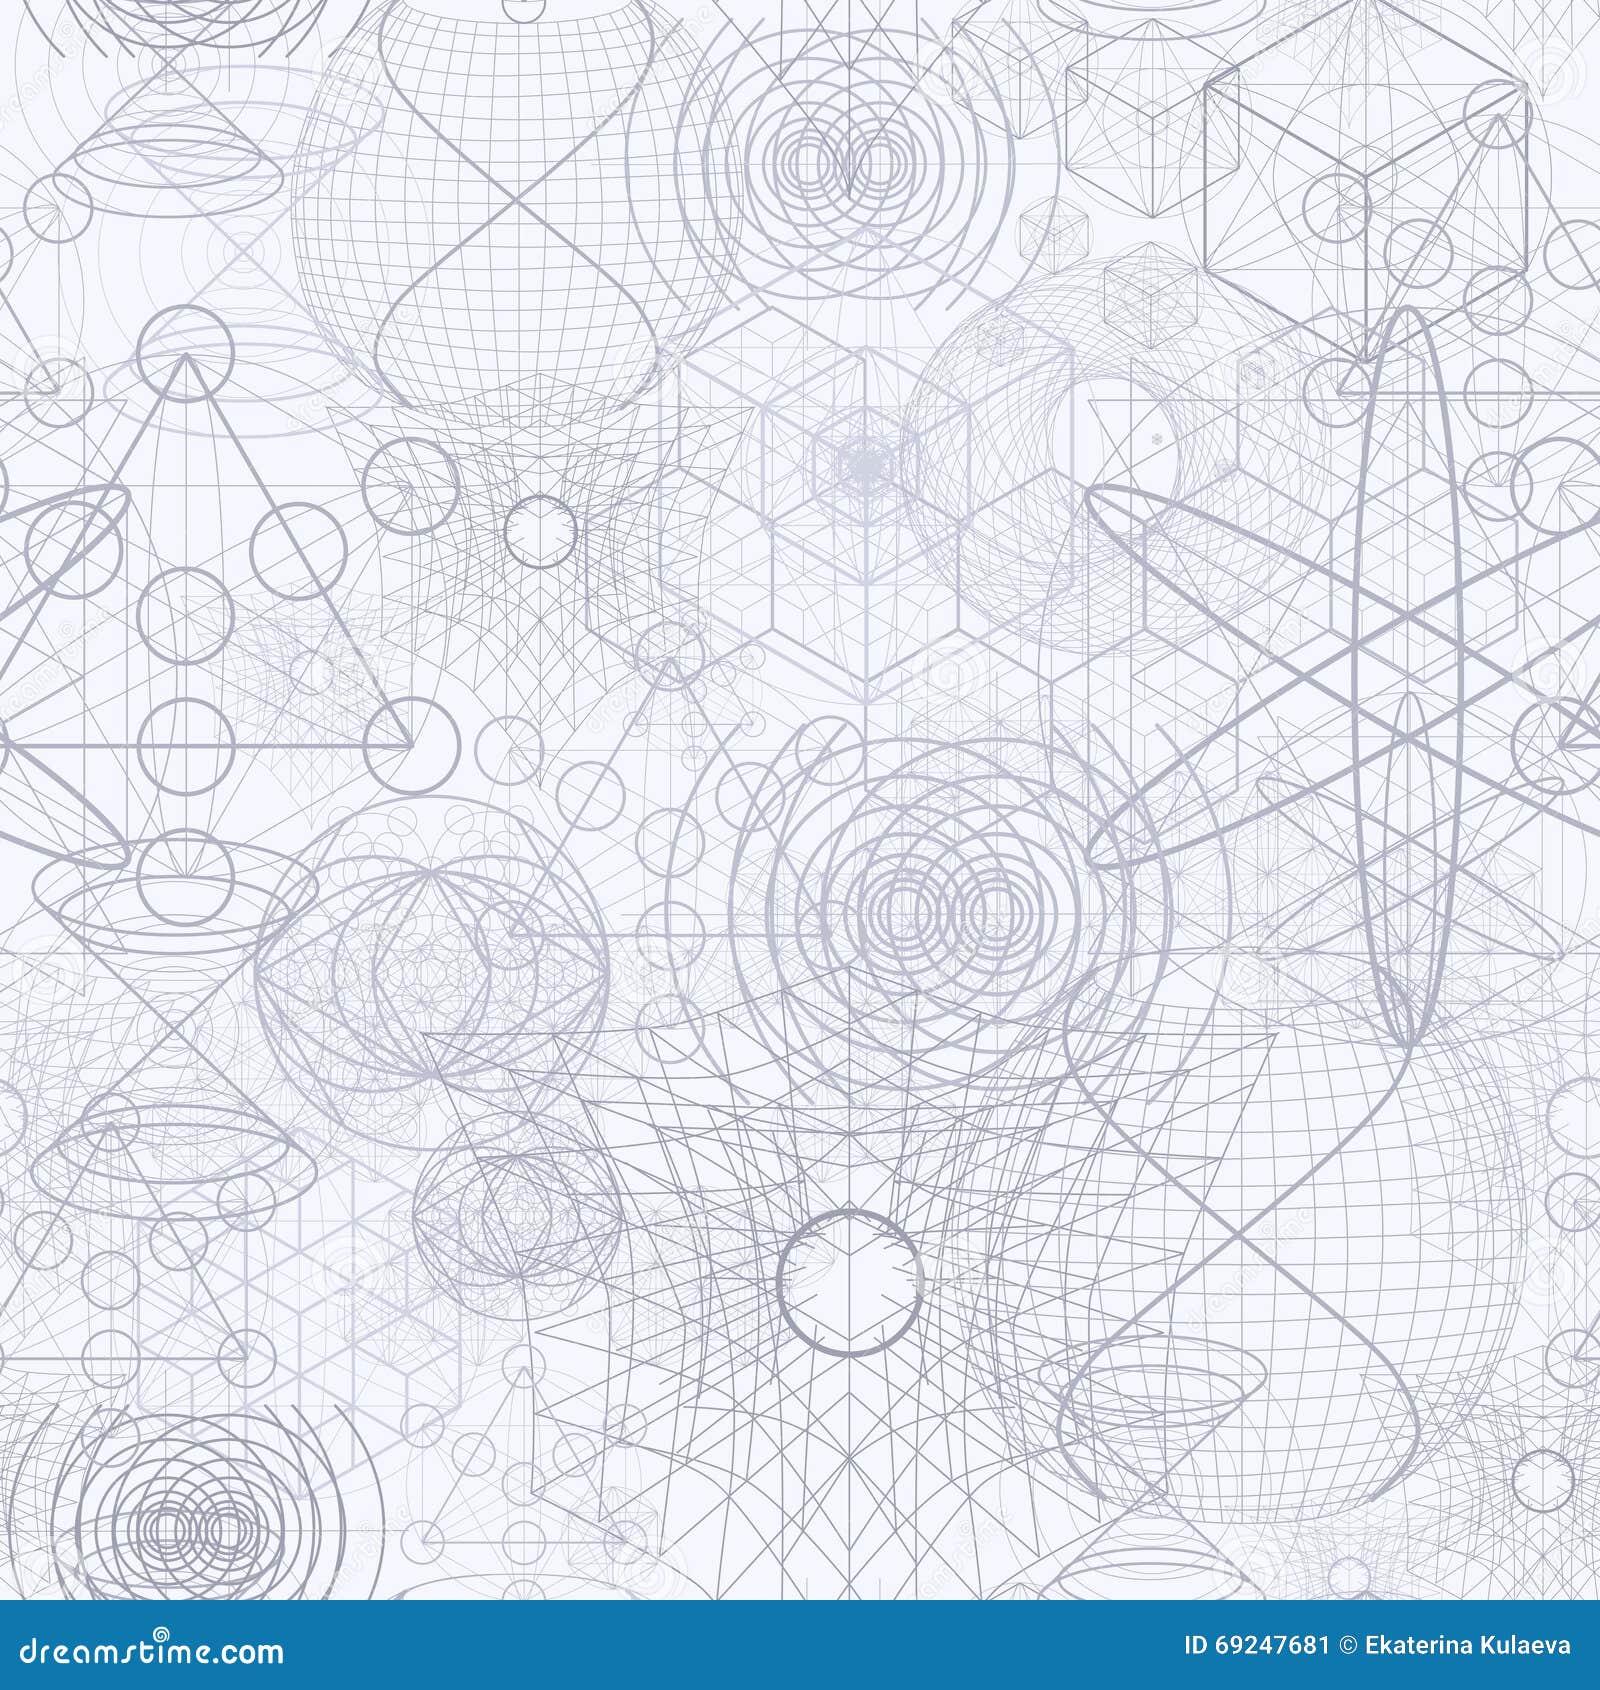 Sacred geometry symbols and elements wallpaper seamless pattern royalty free stock photo biocorpaavc